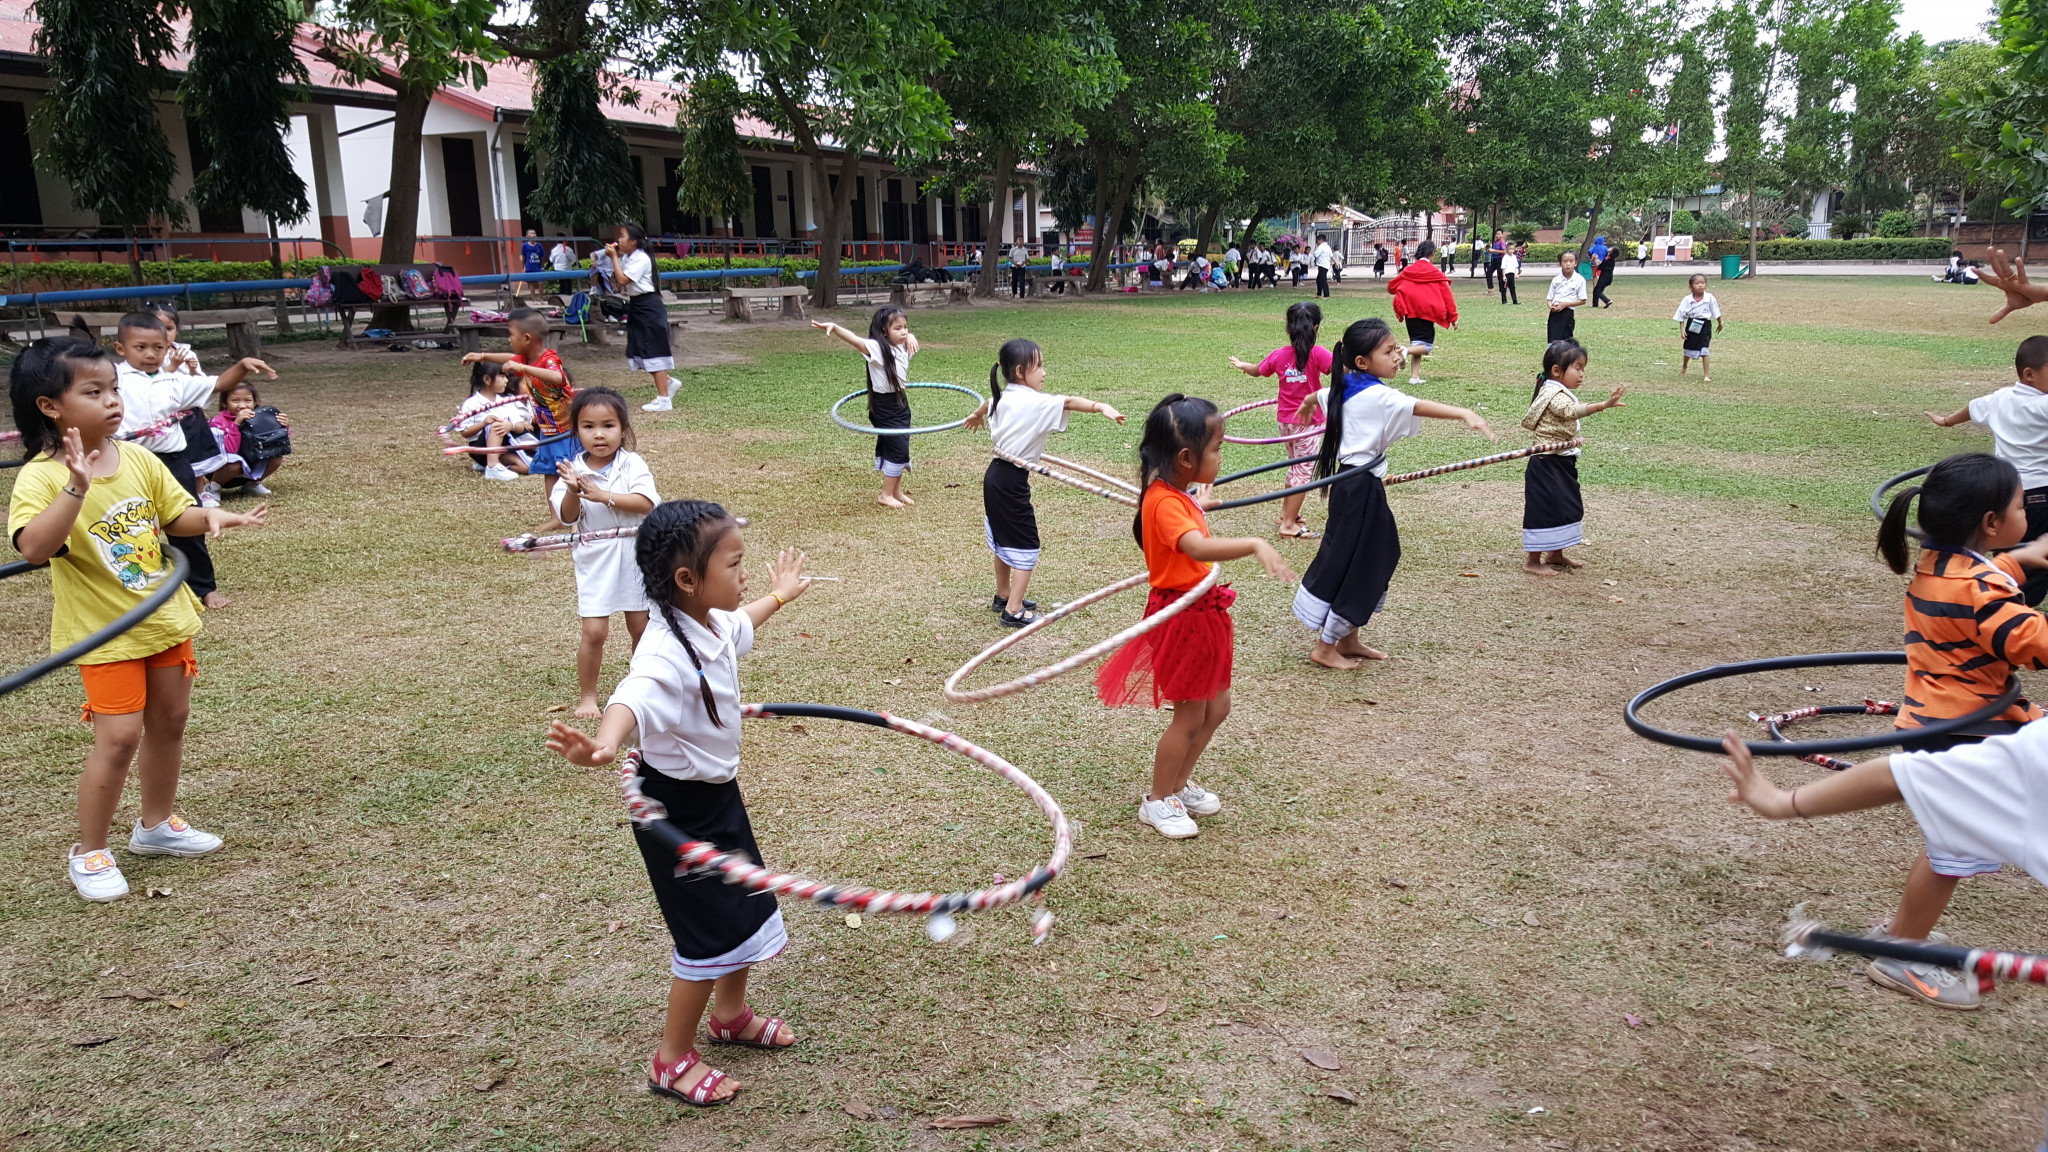 Ban Phang Heng lower secondary school